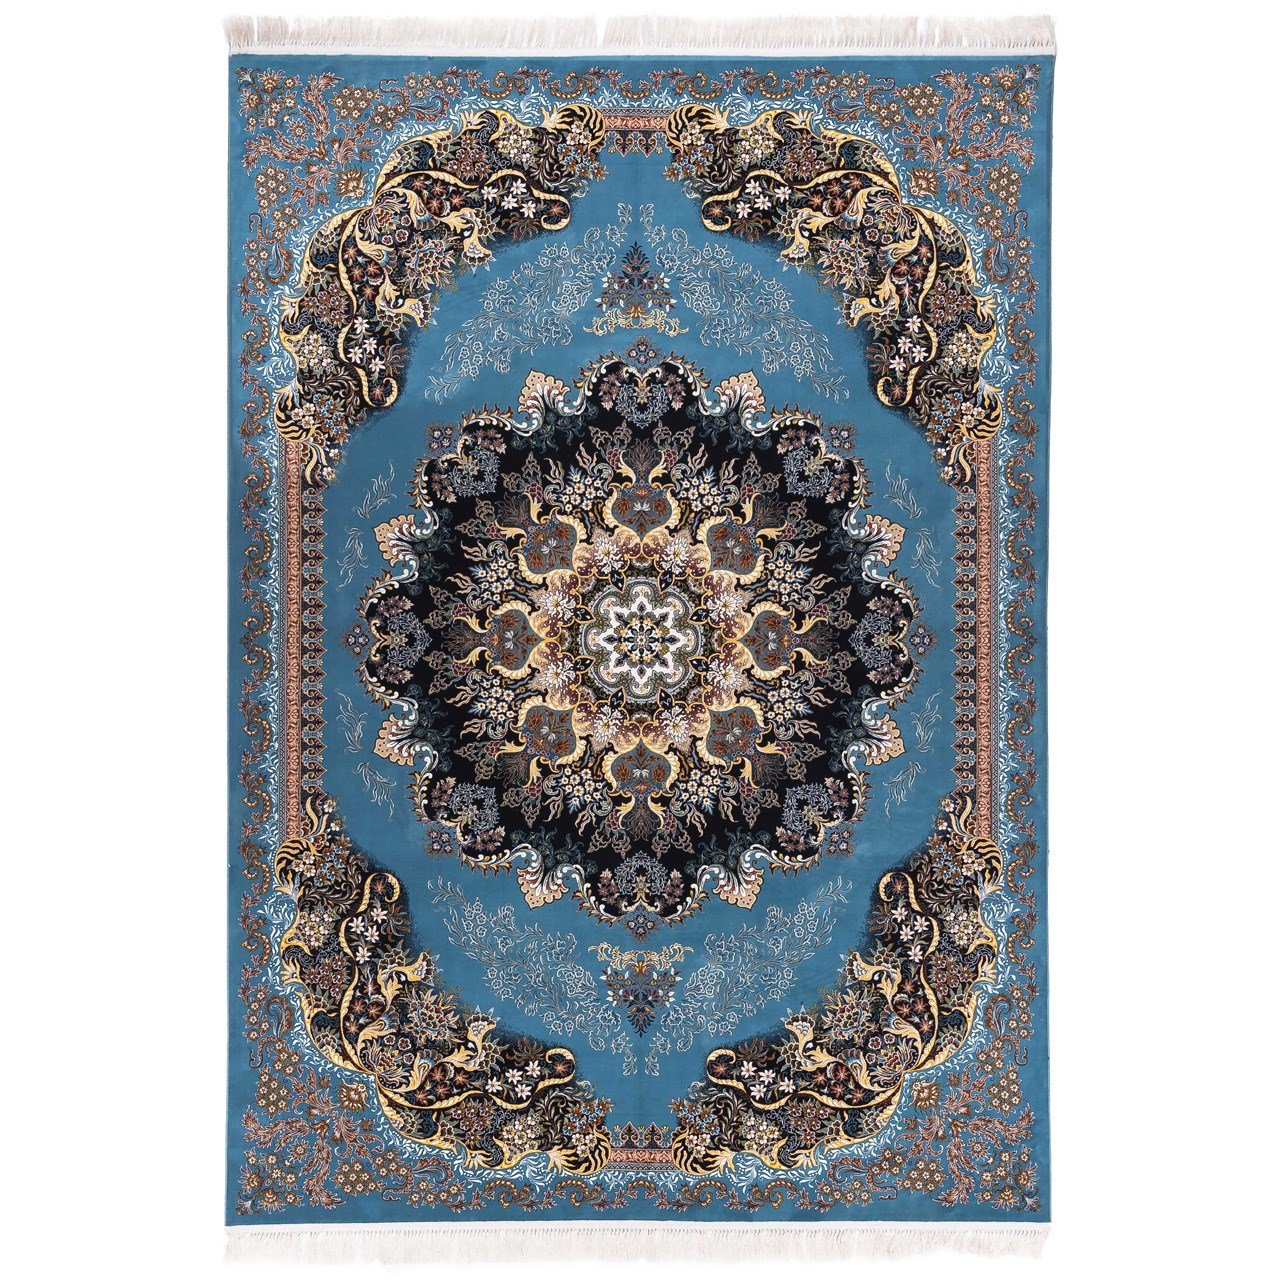 فرش ماشینی دنیای فرش  طرح گیسو زمینه آبی